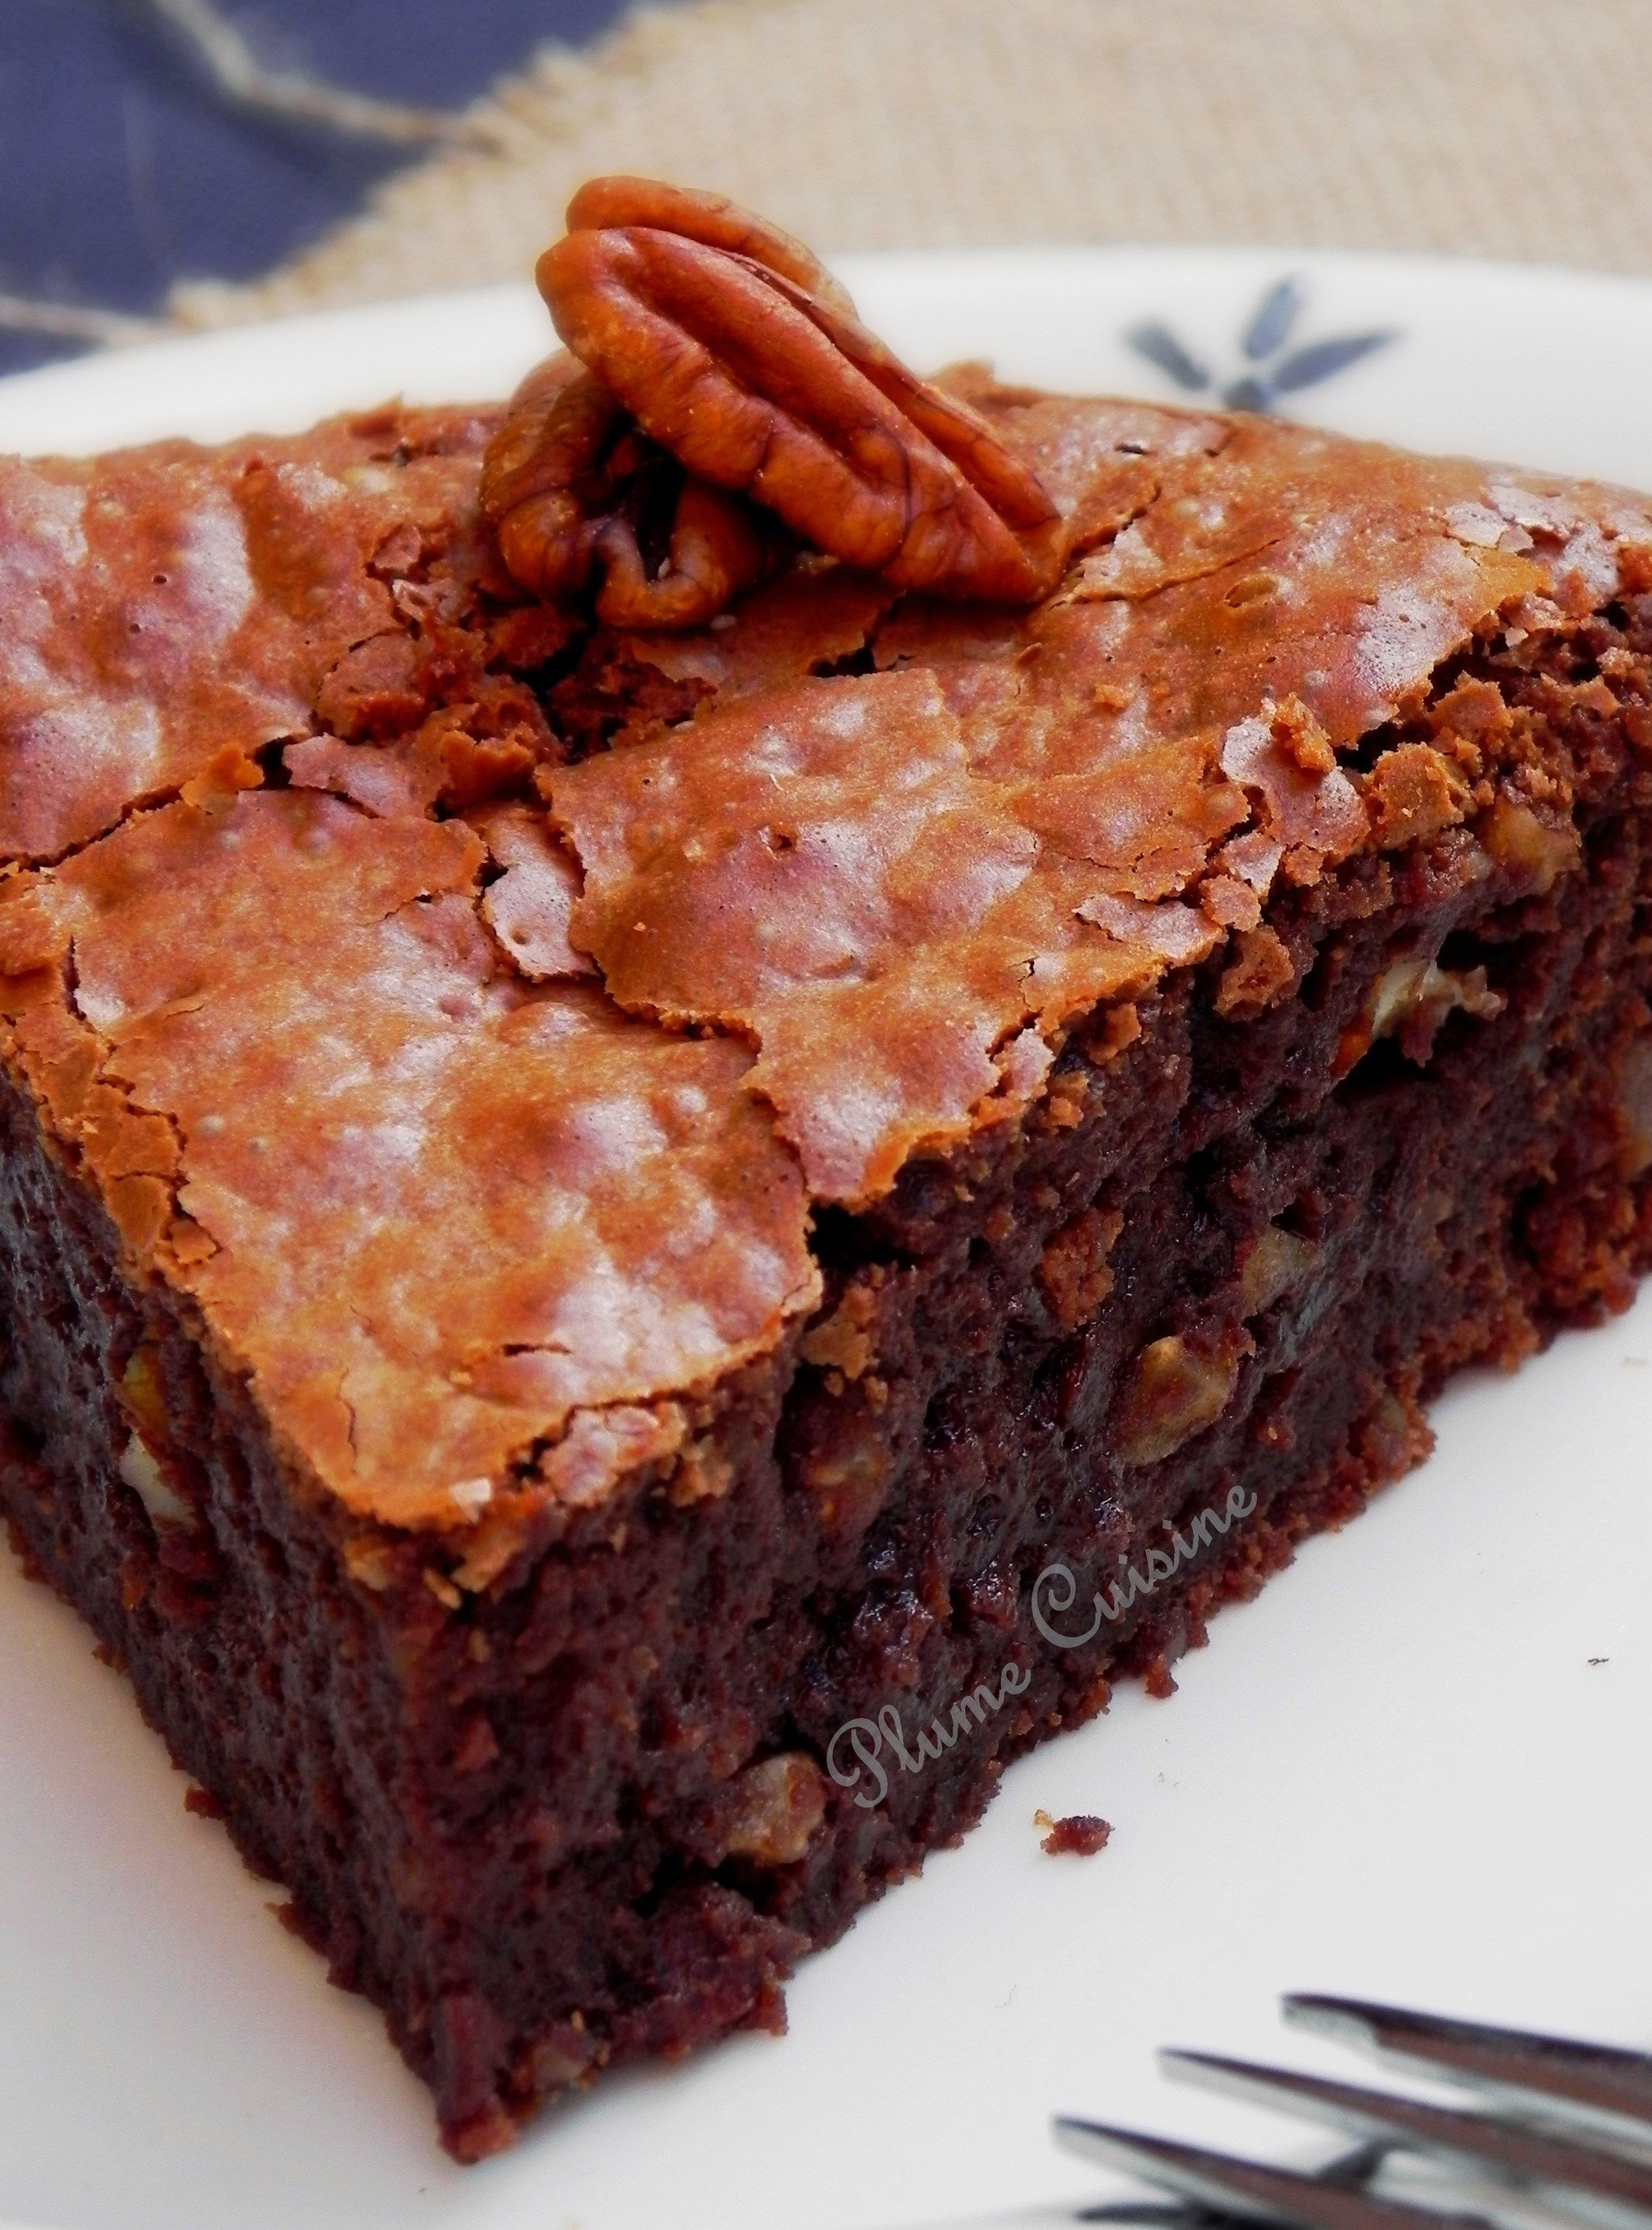 Gateau chocolat noix